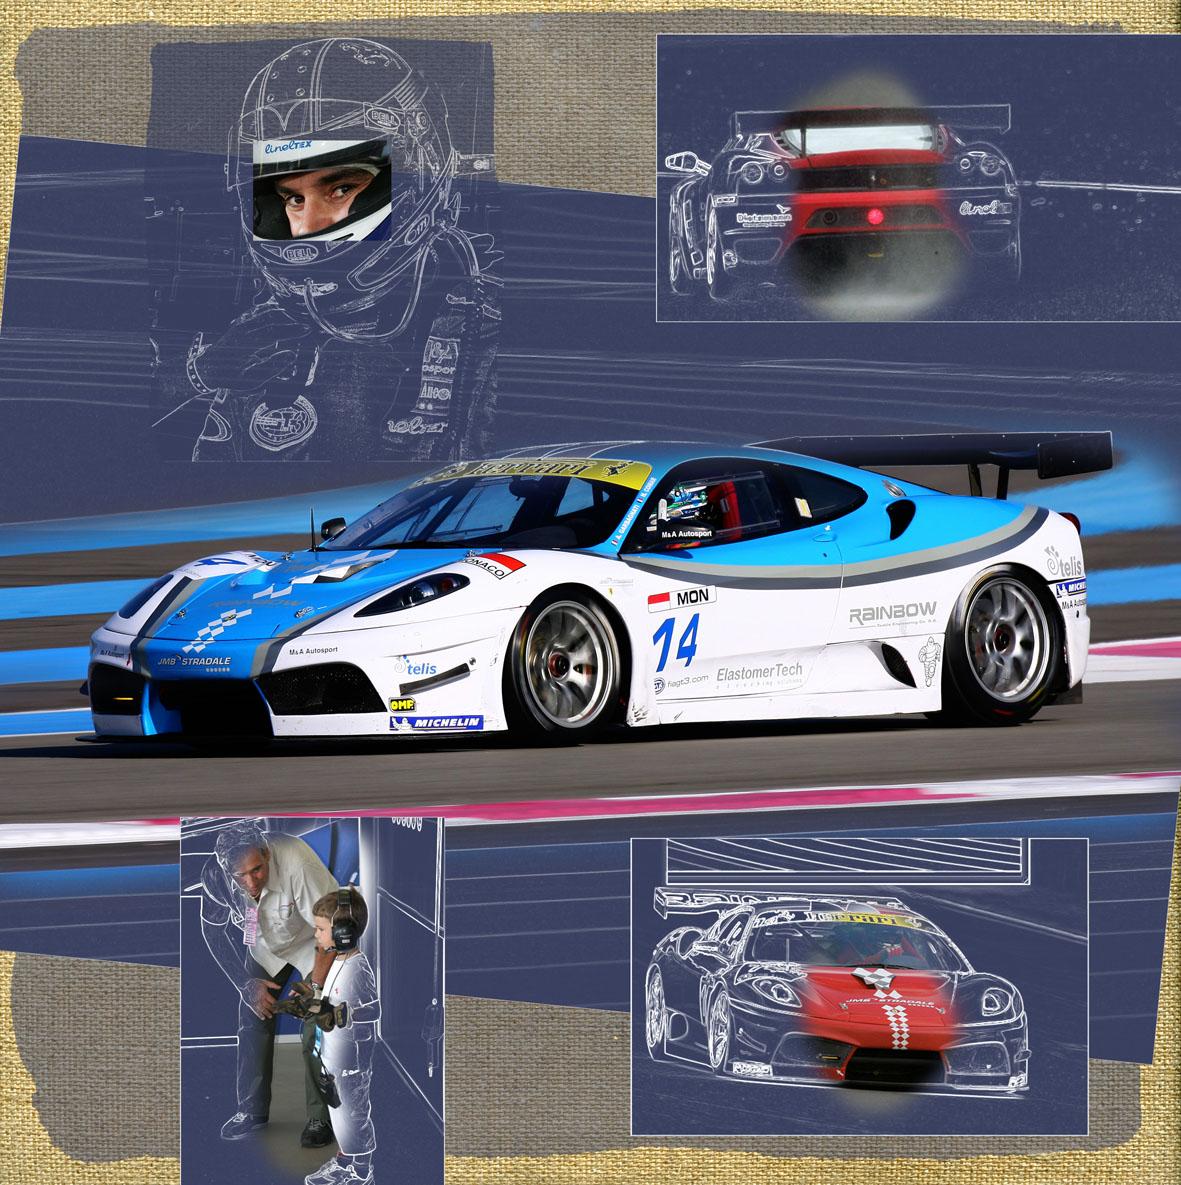 430 GT3 Garbagnati Dubai - 2006